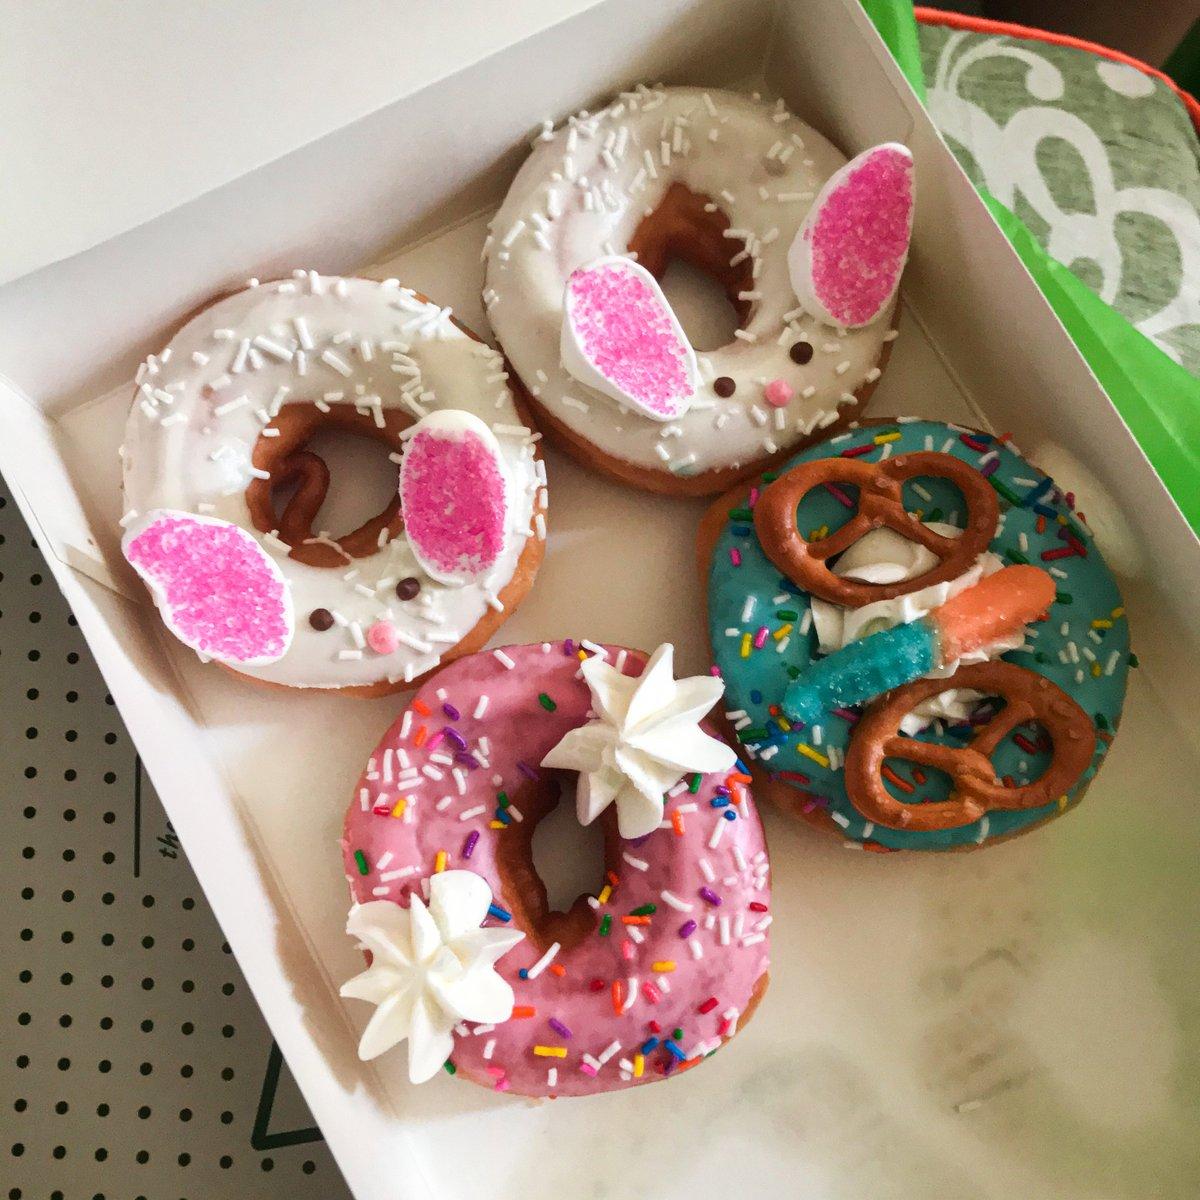 Funny Bunnies by Krispy Kreme. 🍩🐰   #photooftheday #pics #picoftheday #bestoftheday #popularpic #popularphoto #foodgasm #food #foodtography #foodporn #foodieph #manilaeatup @marty91190 #trivia @krispykreme @krispykremeph